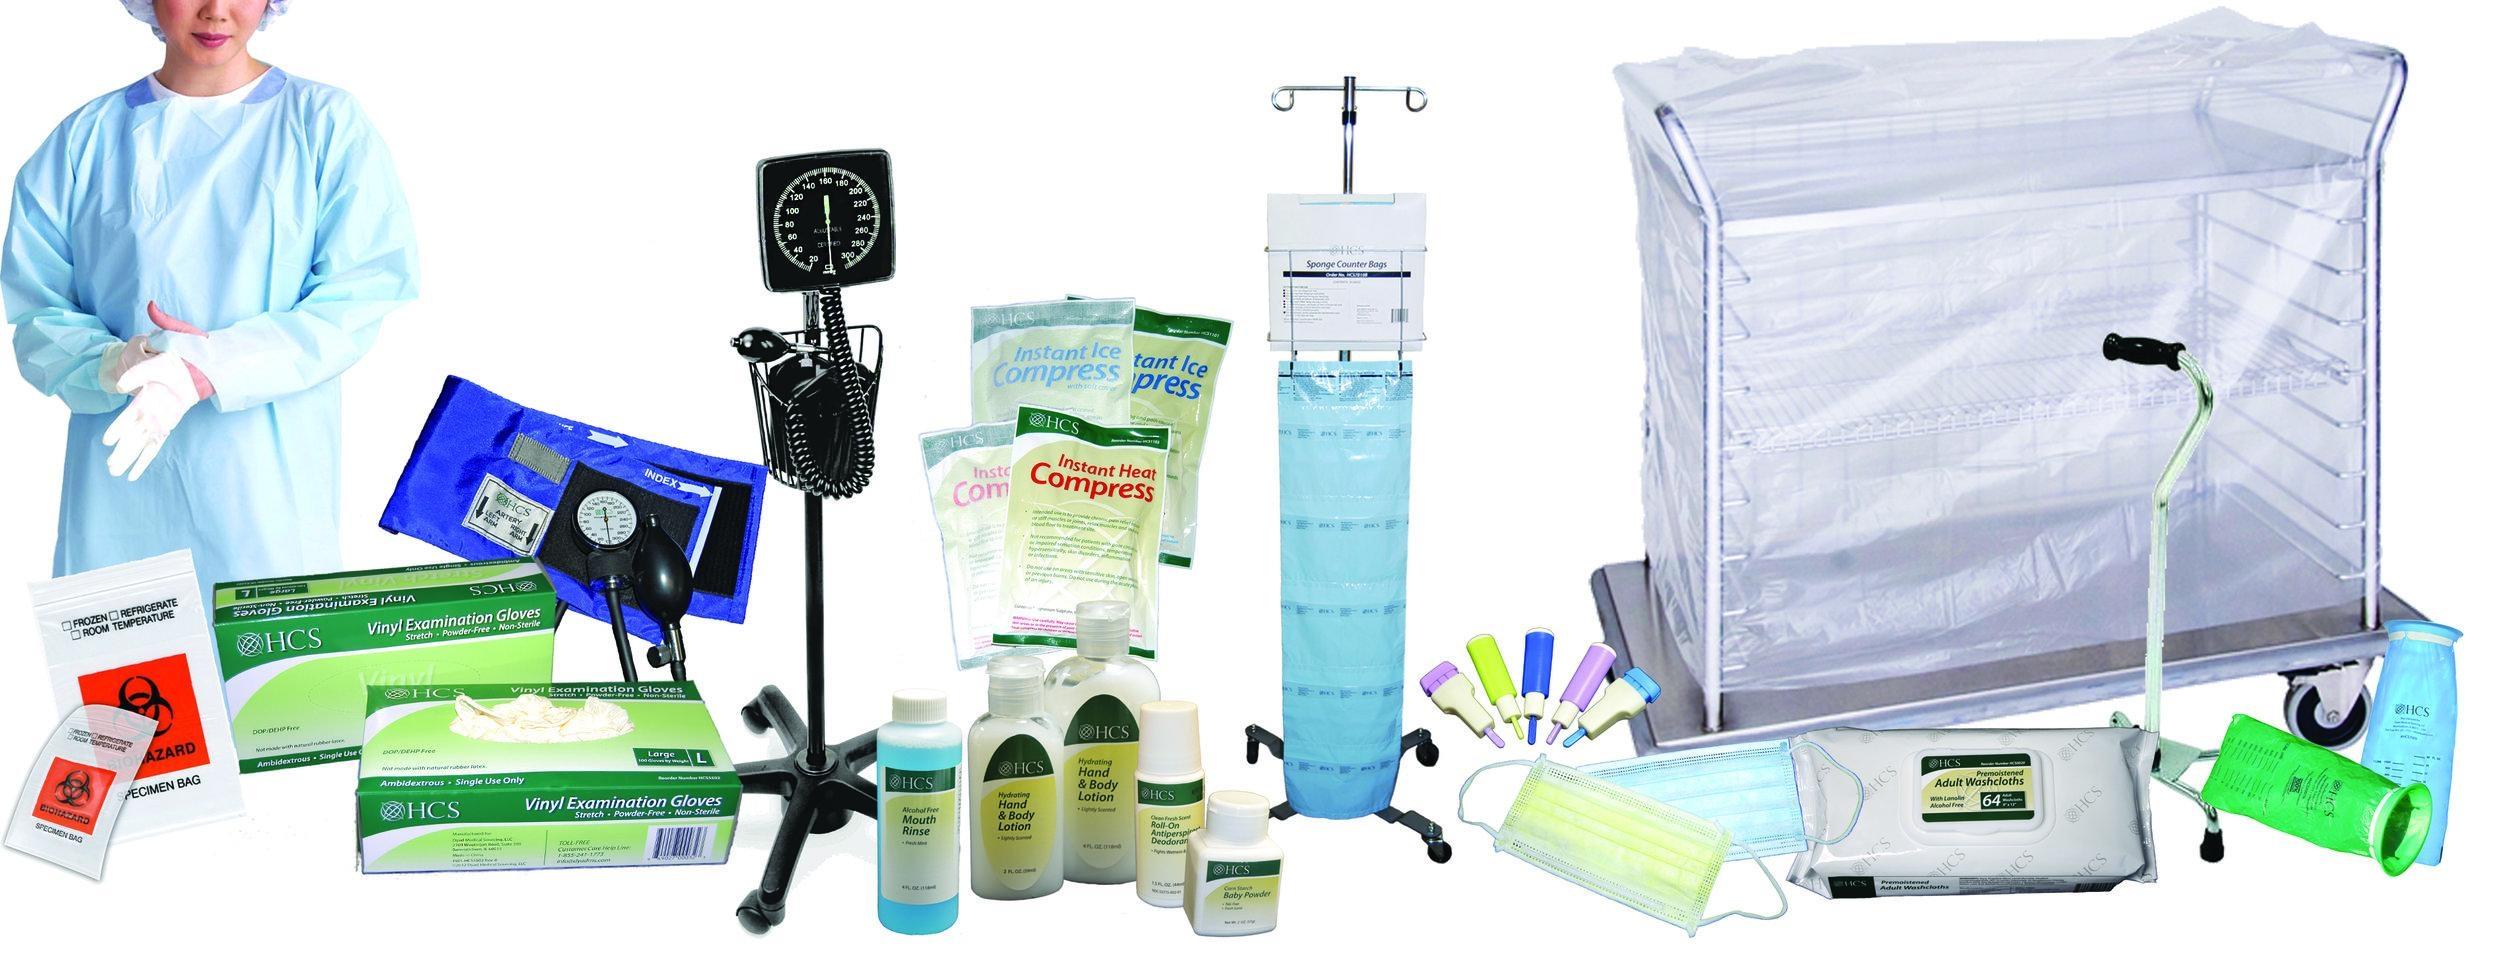 HCS Group Product Pic.jpg